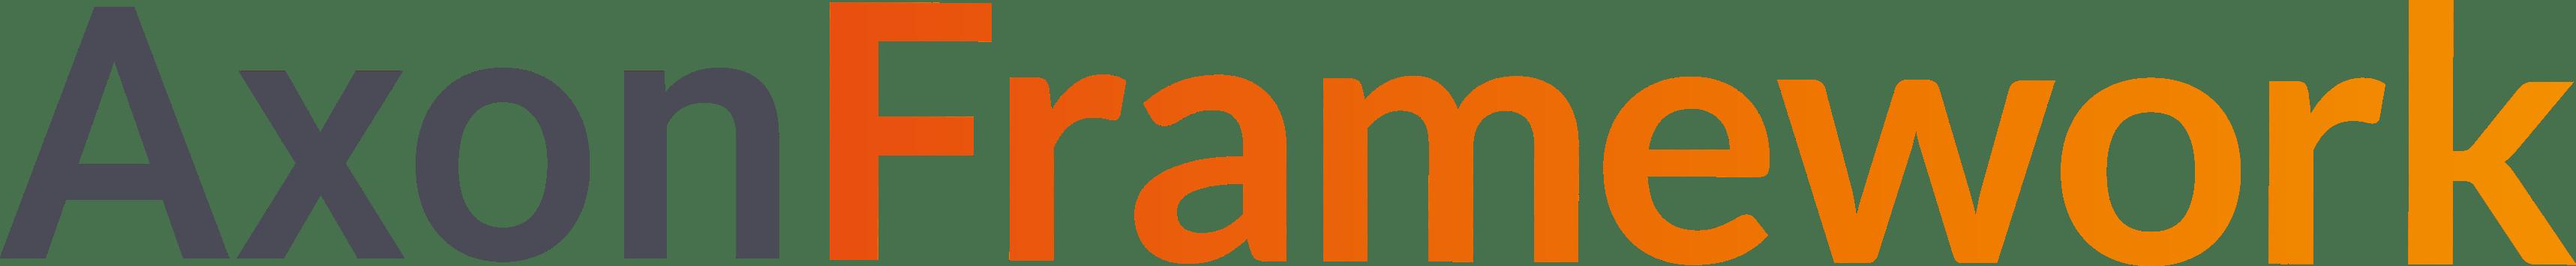 AxonFramework logo